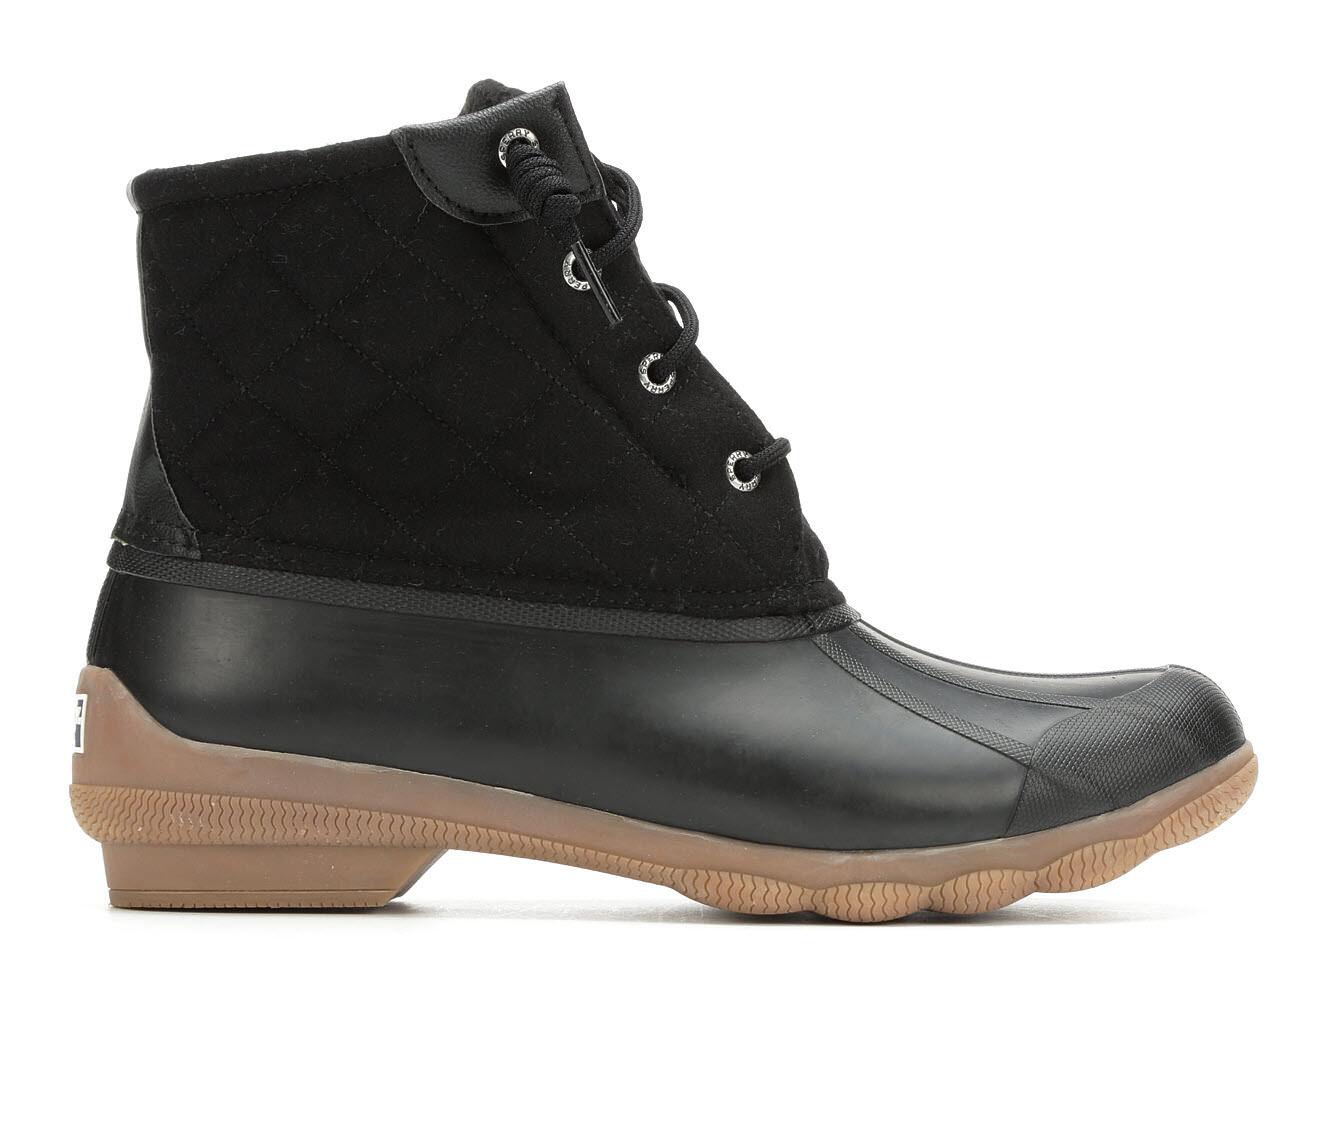 uk shoes_kd3231